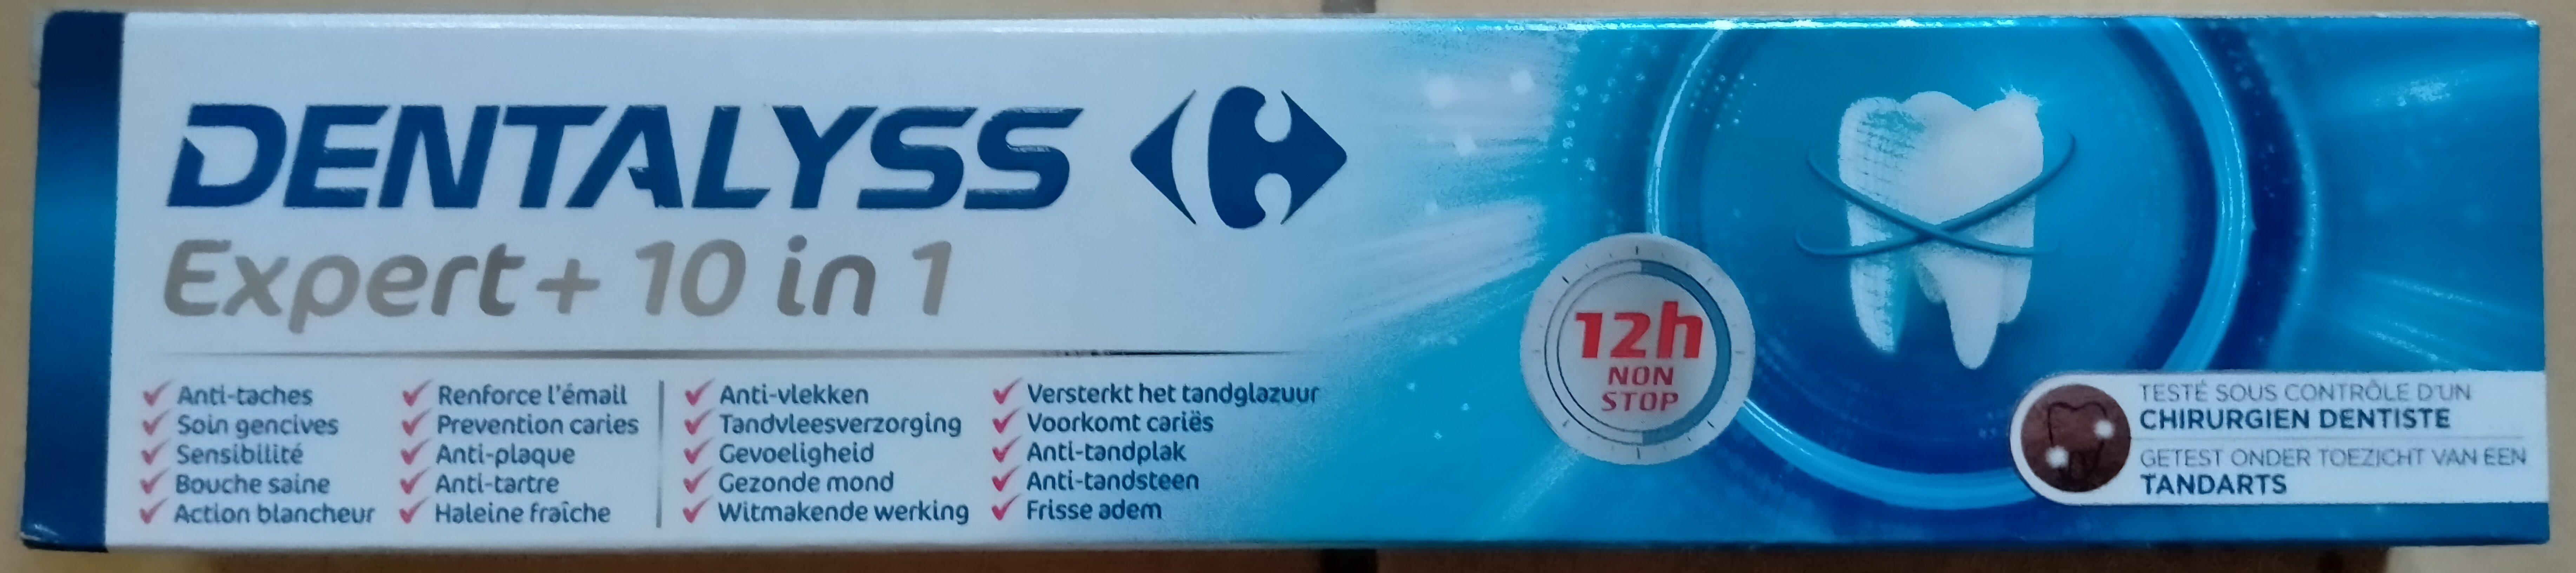 Dentalyss expert 10 en 1 - Product - fr